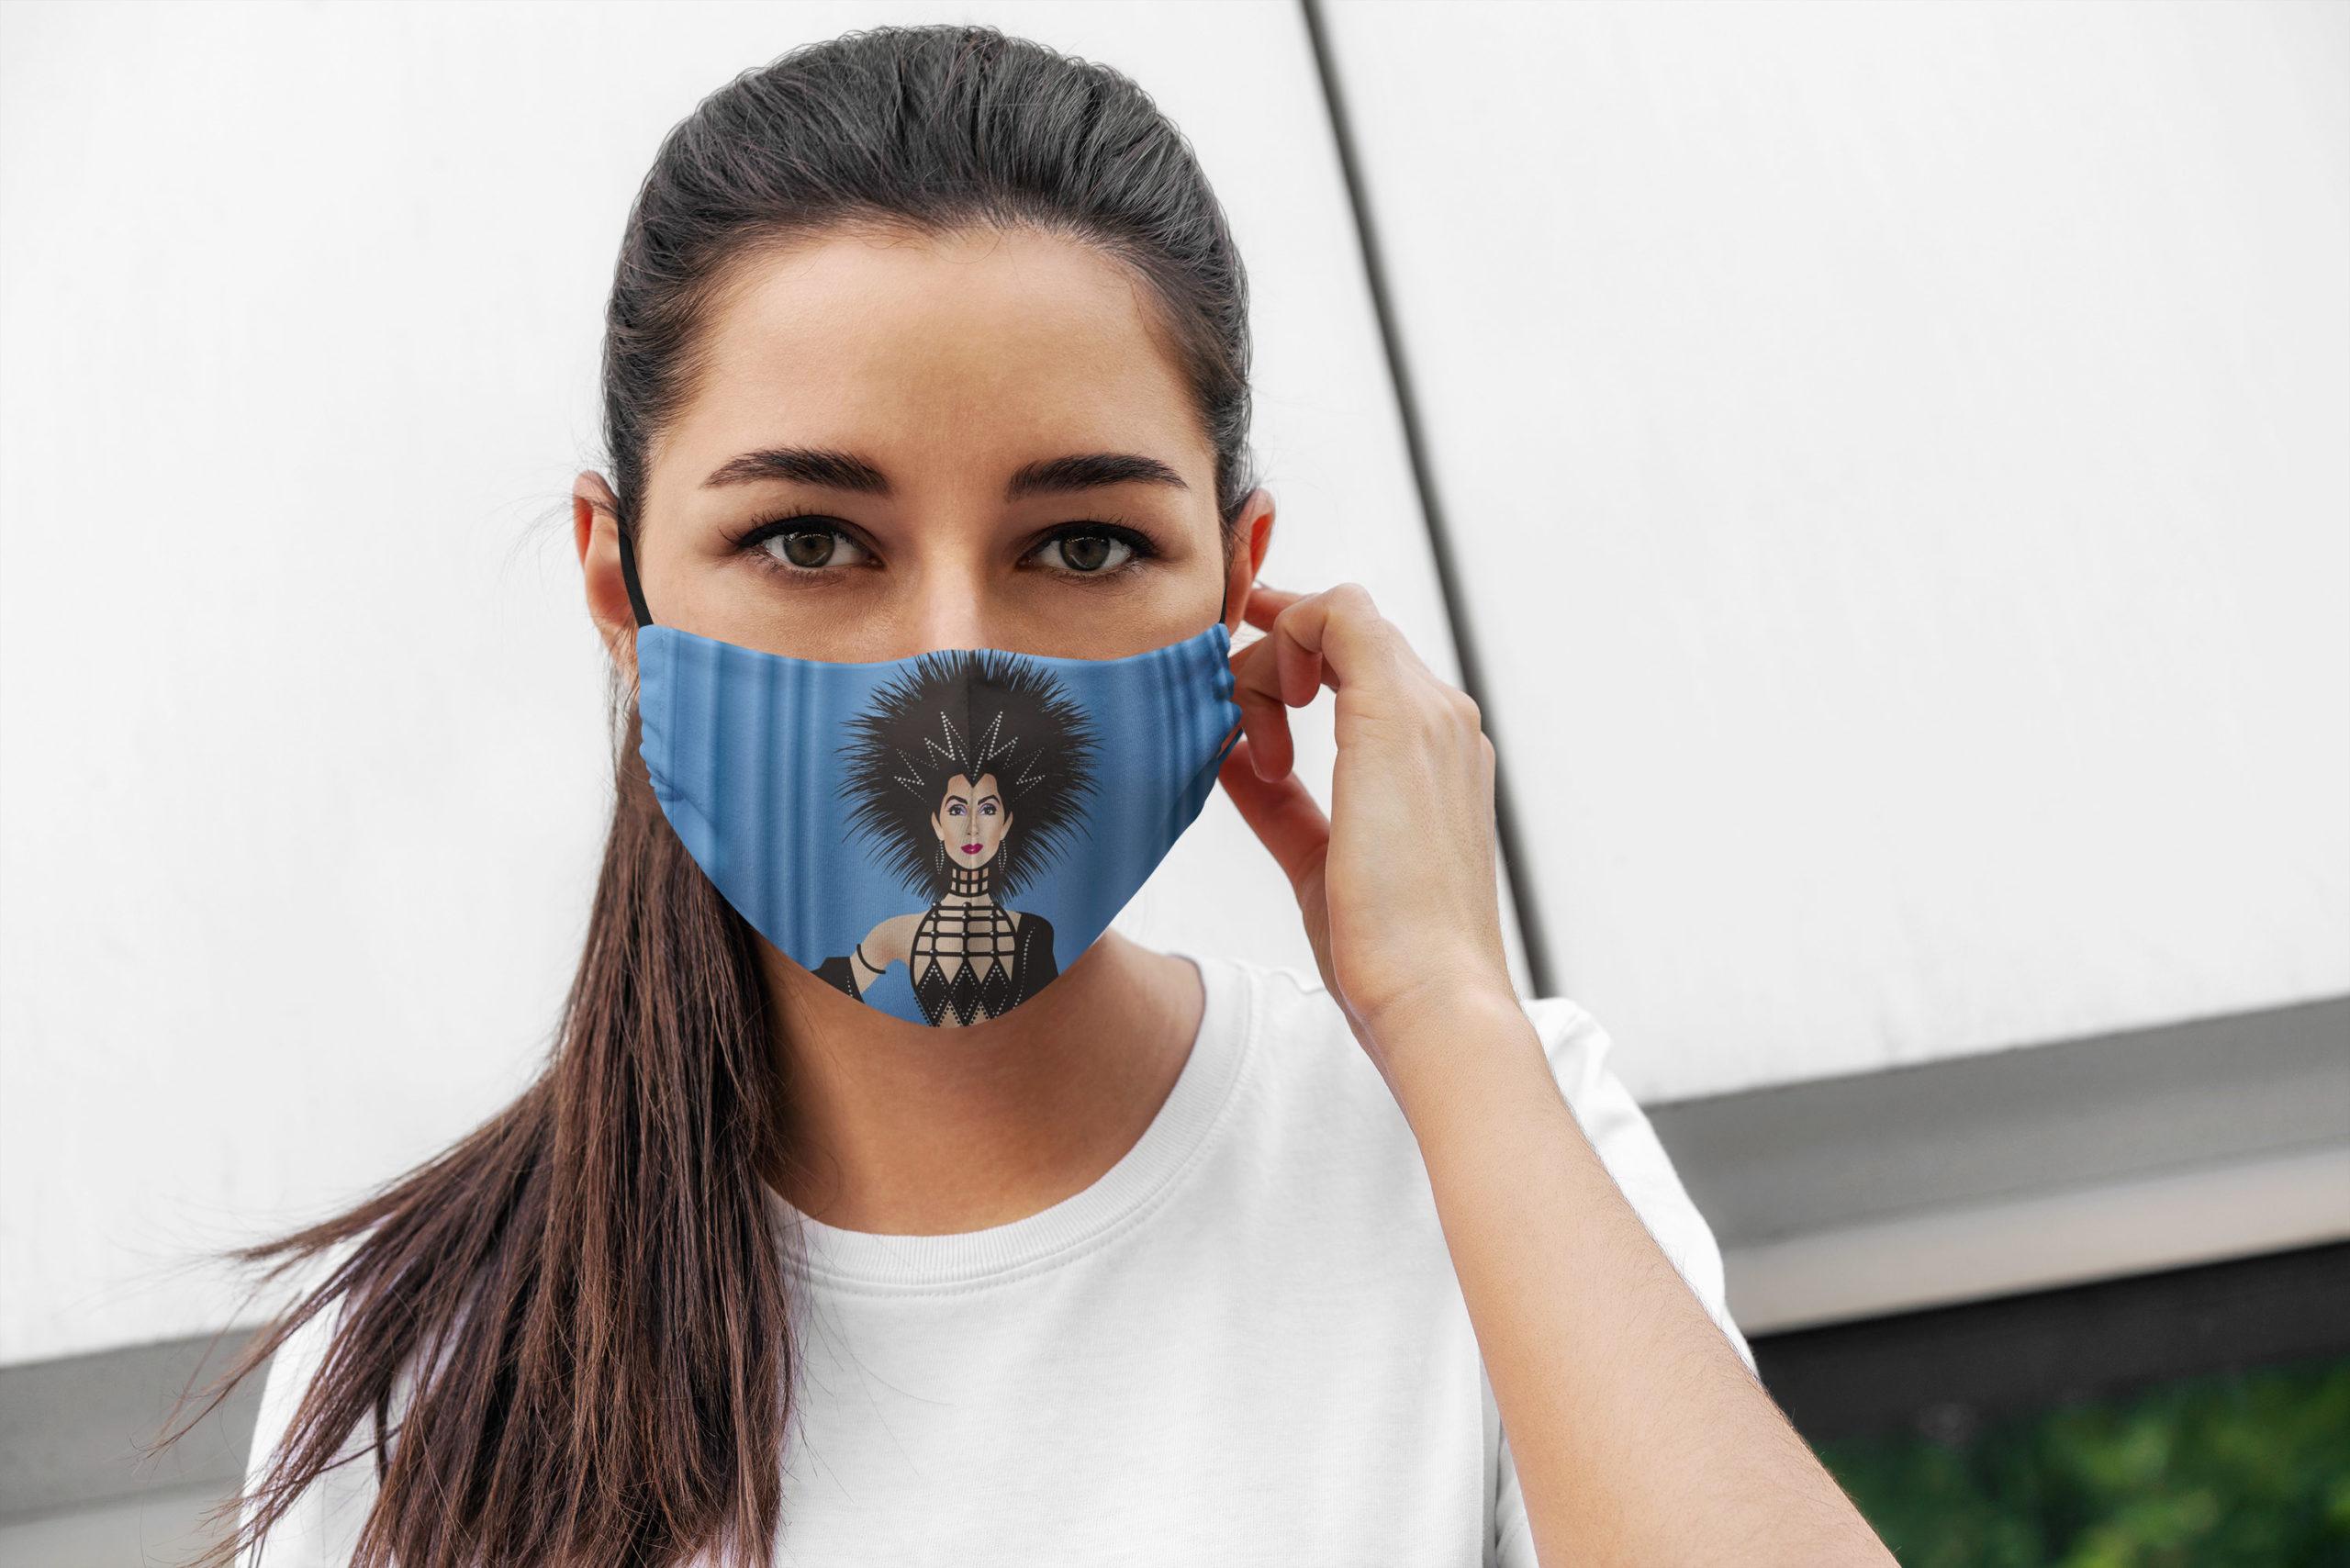 Cherilyn sarkisian cher all over printed face mask 3